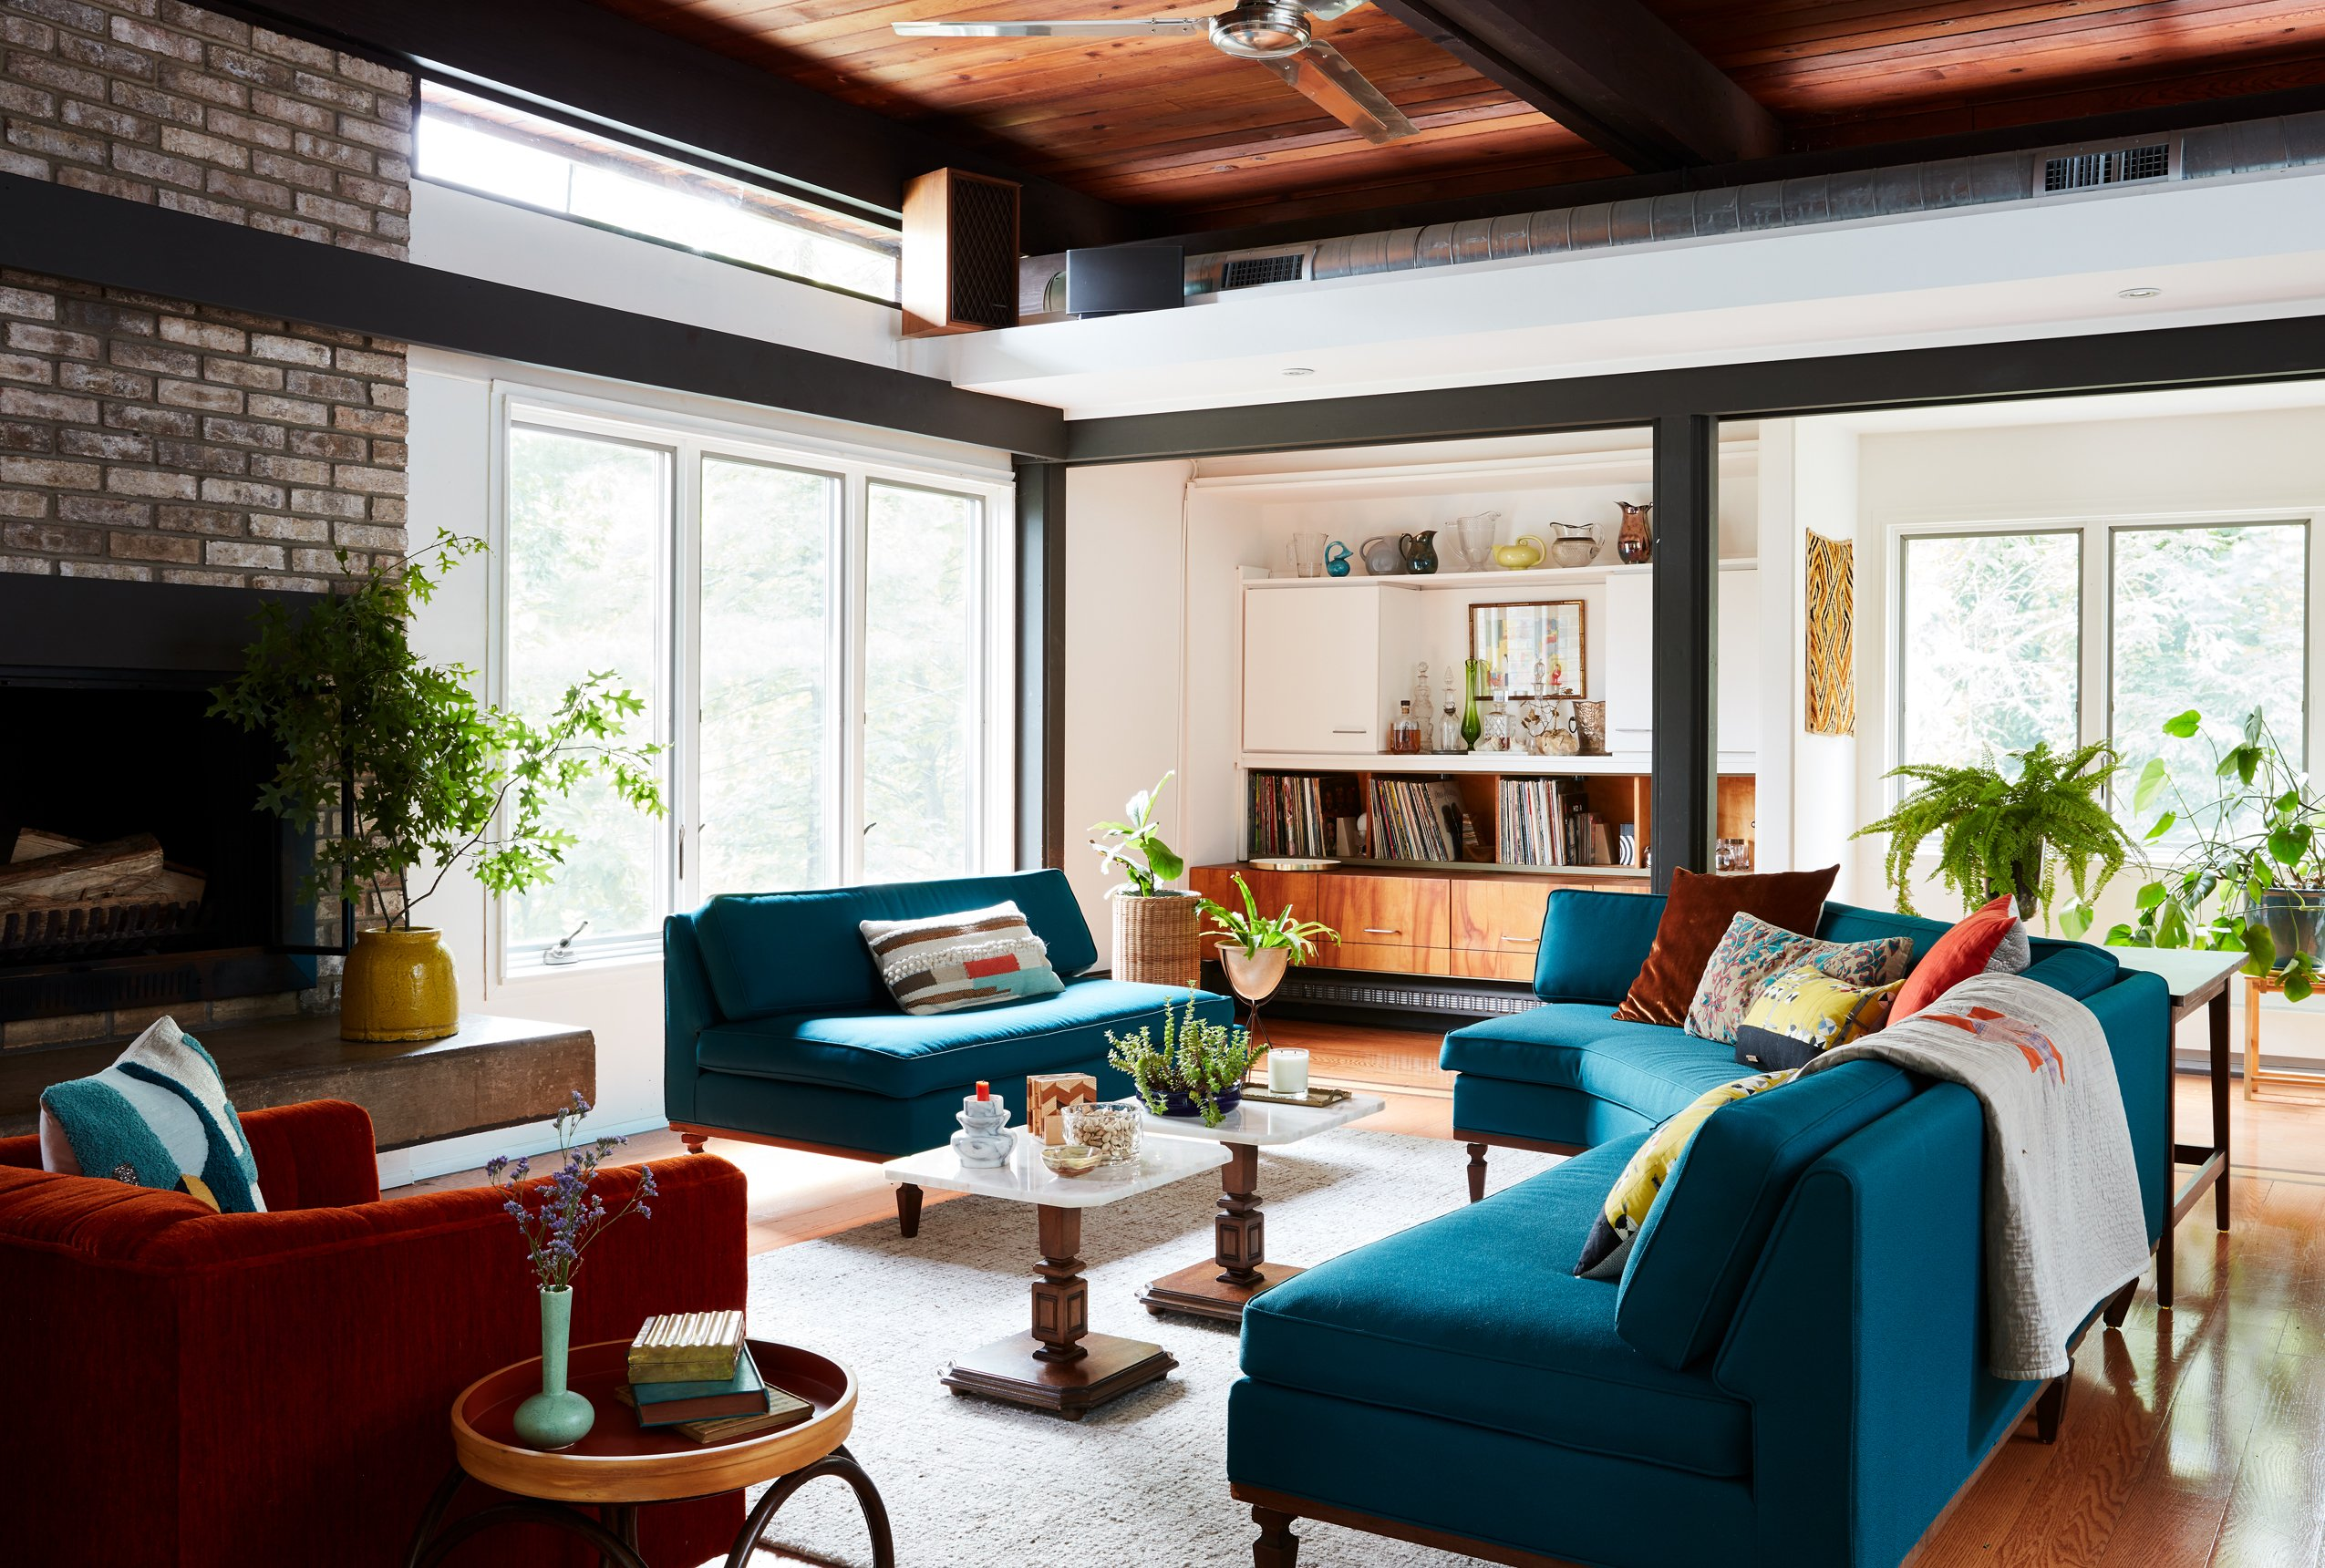 brandi adoff / better homes & gardens